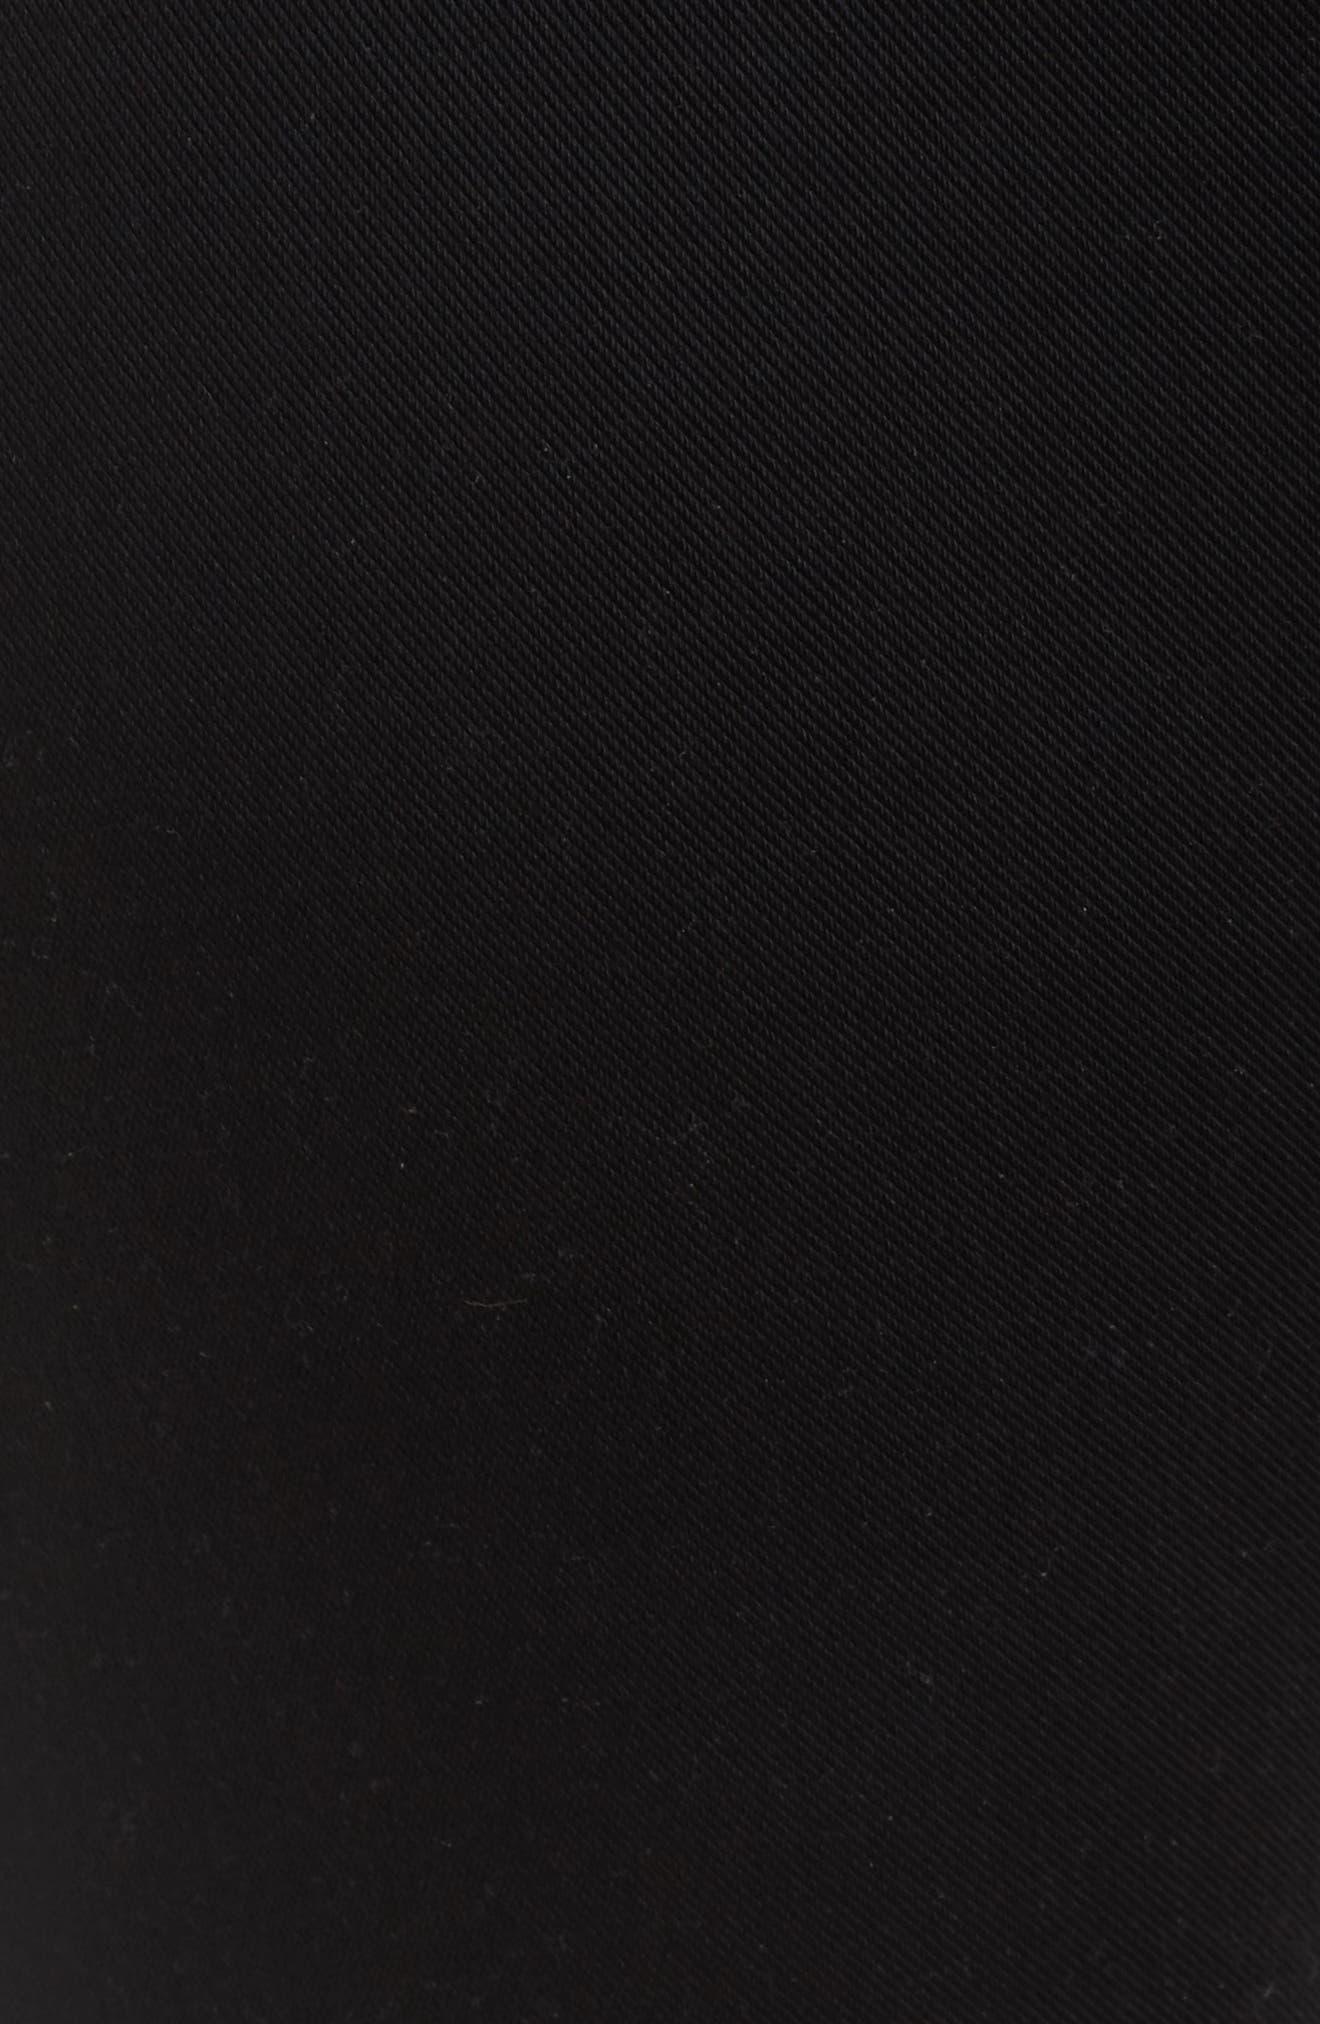 Jean-ish Leggings,                             Alternate thumbnail 6, color,                             Black